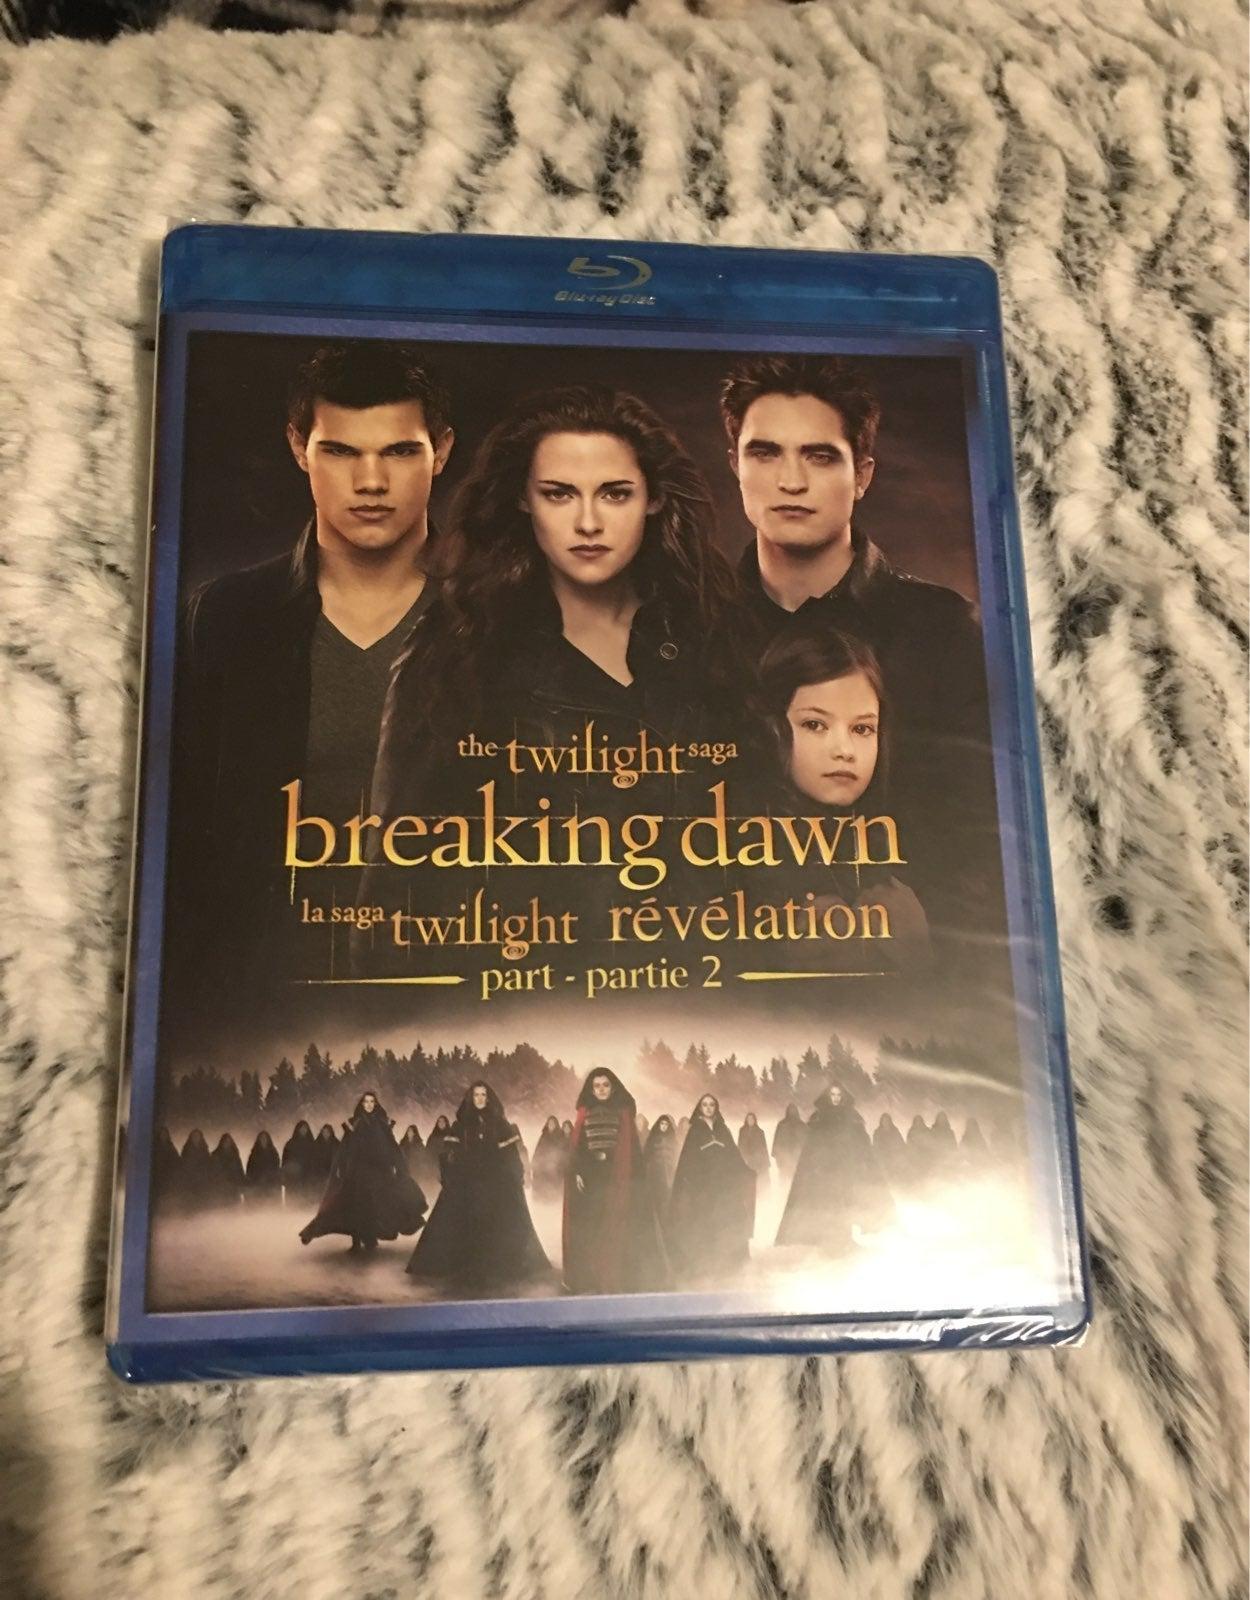 The twilight saga two movies